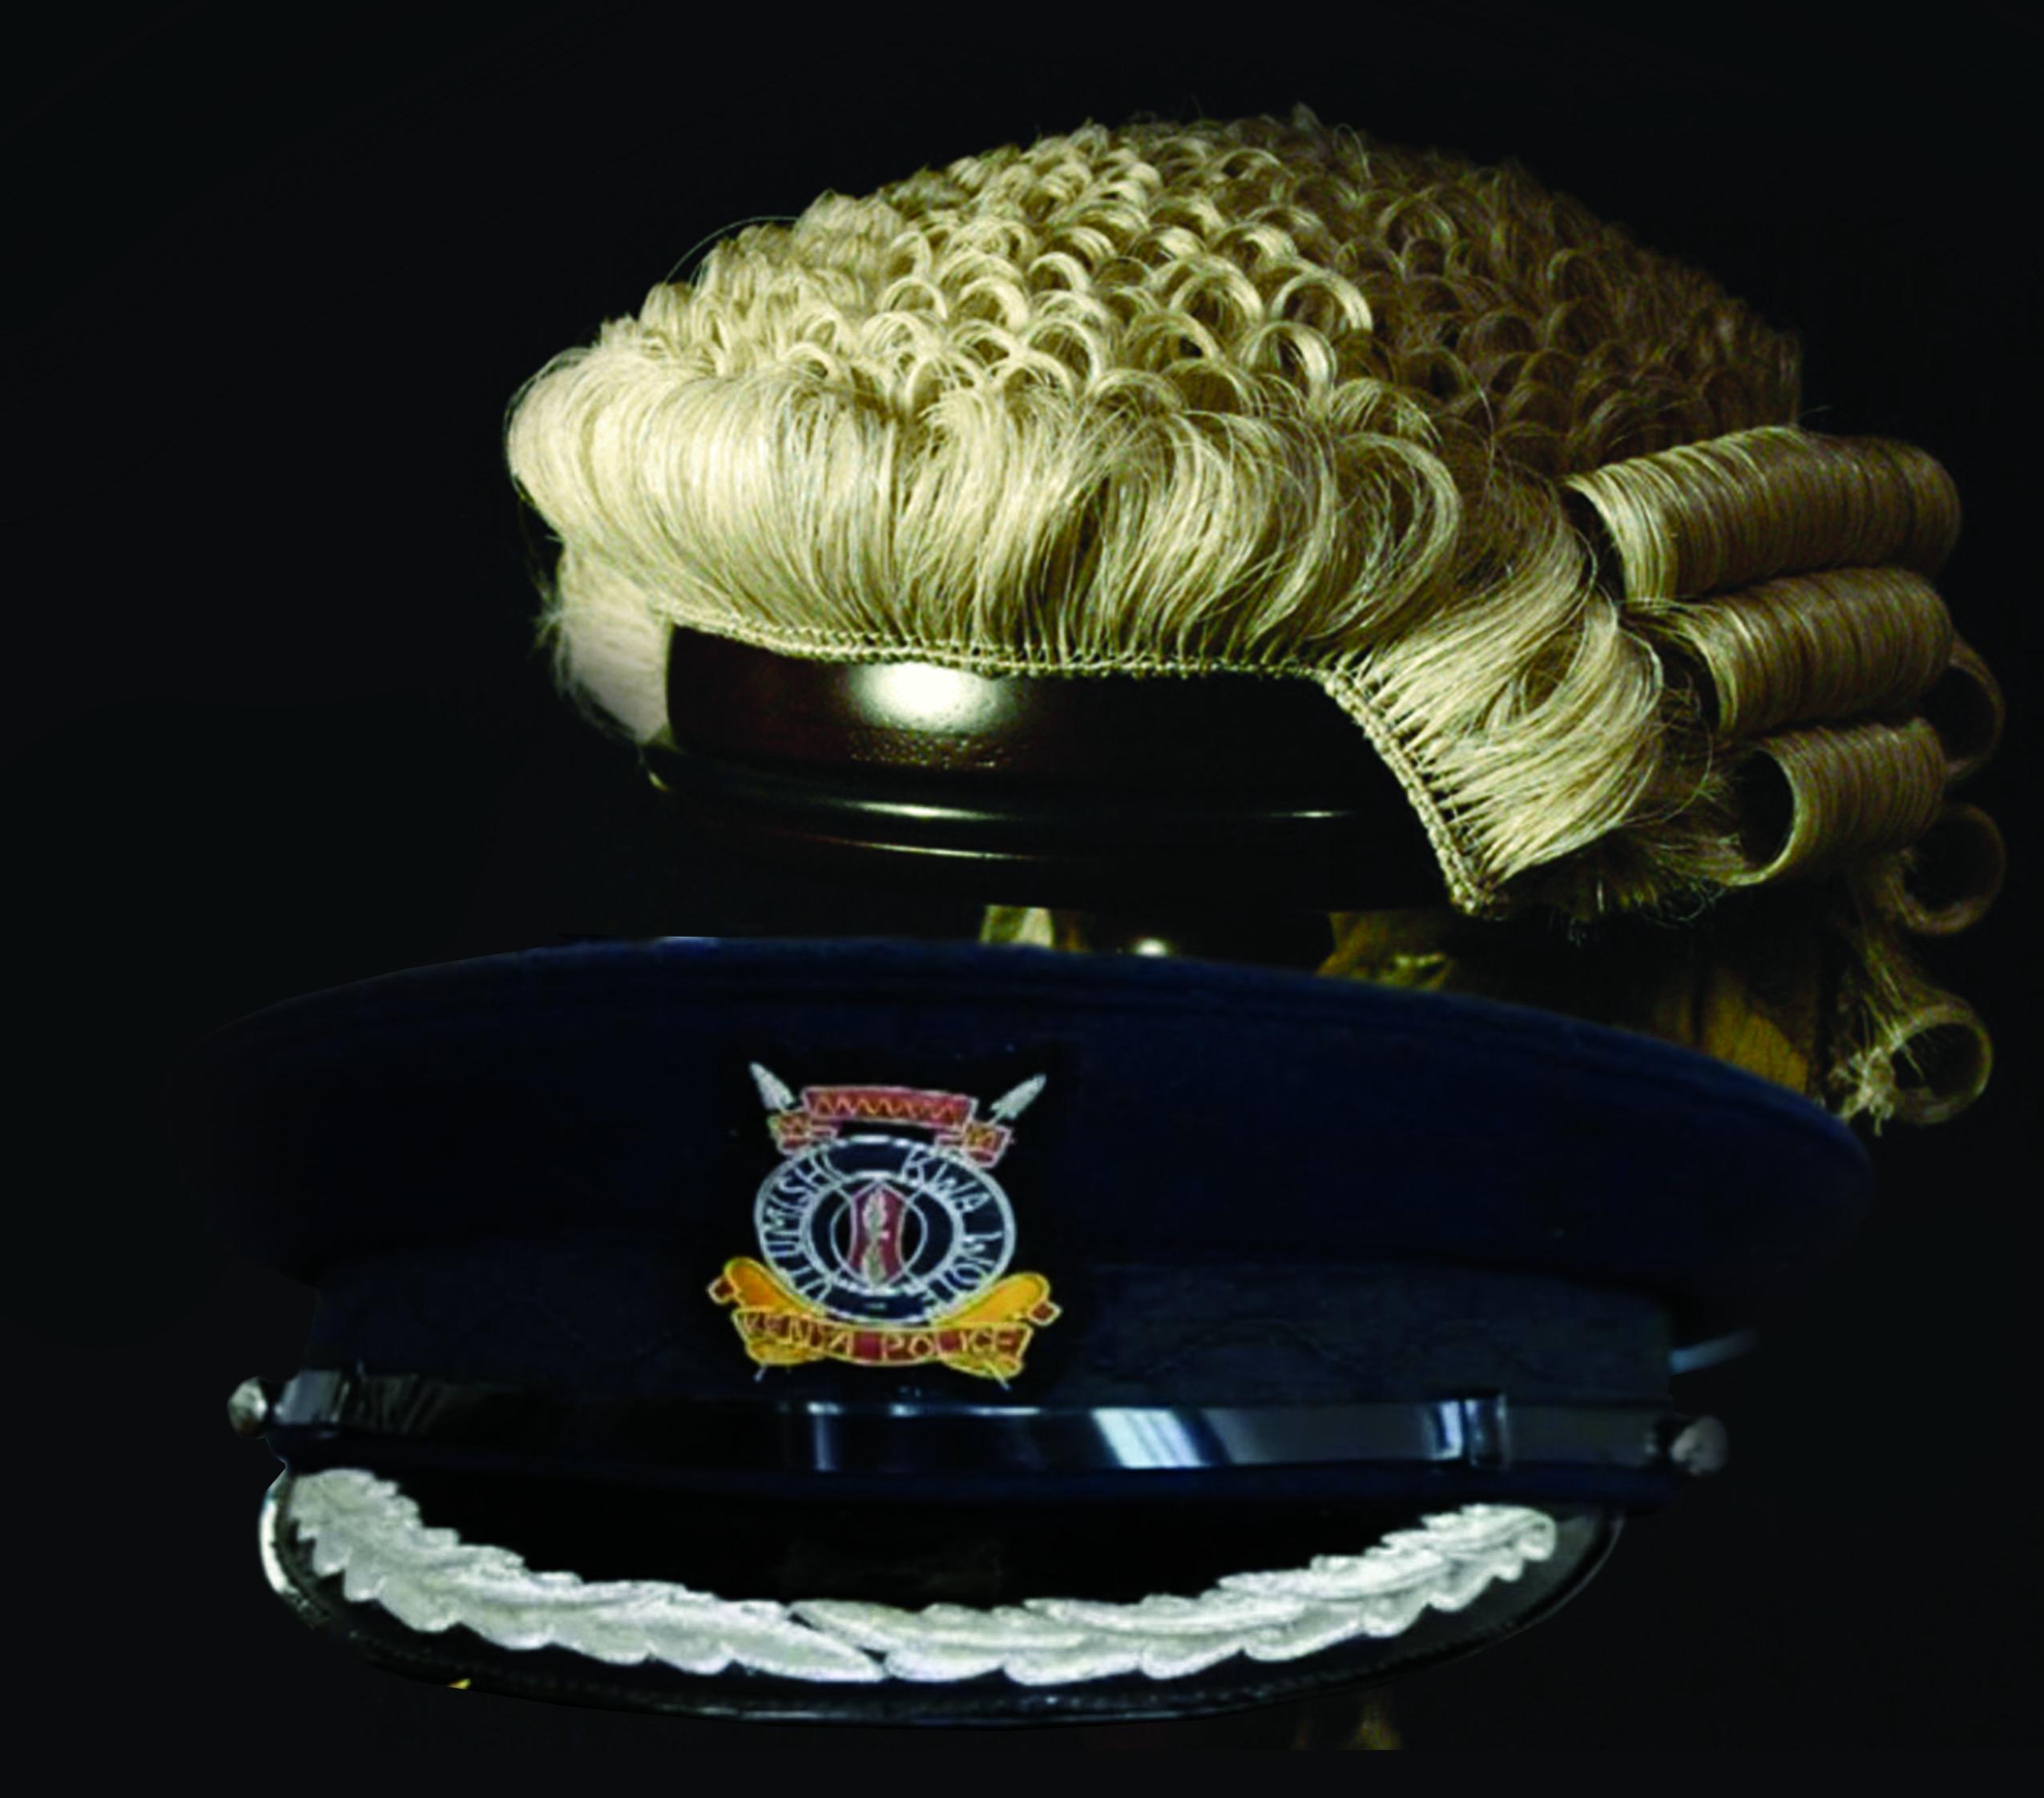 prosecutors vs investigators: Demarcating legal functional autonomy